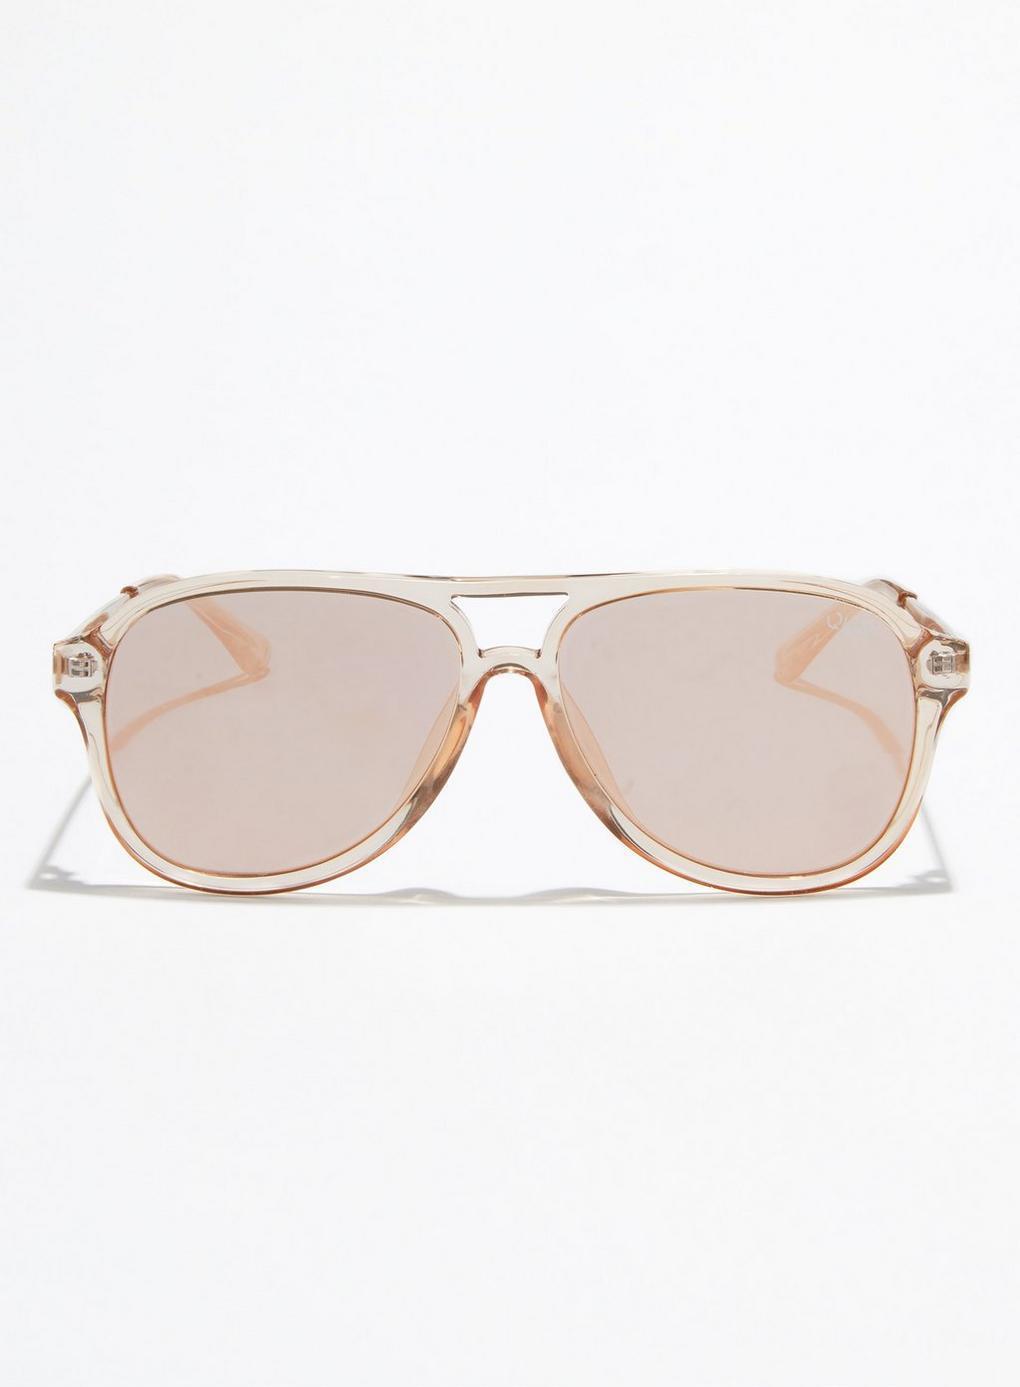 ea8bdd99abad7 Miss Selfridge. Women s Quay Australia Under Pressure Sunglasses